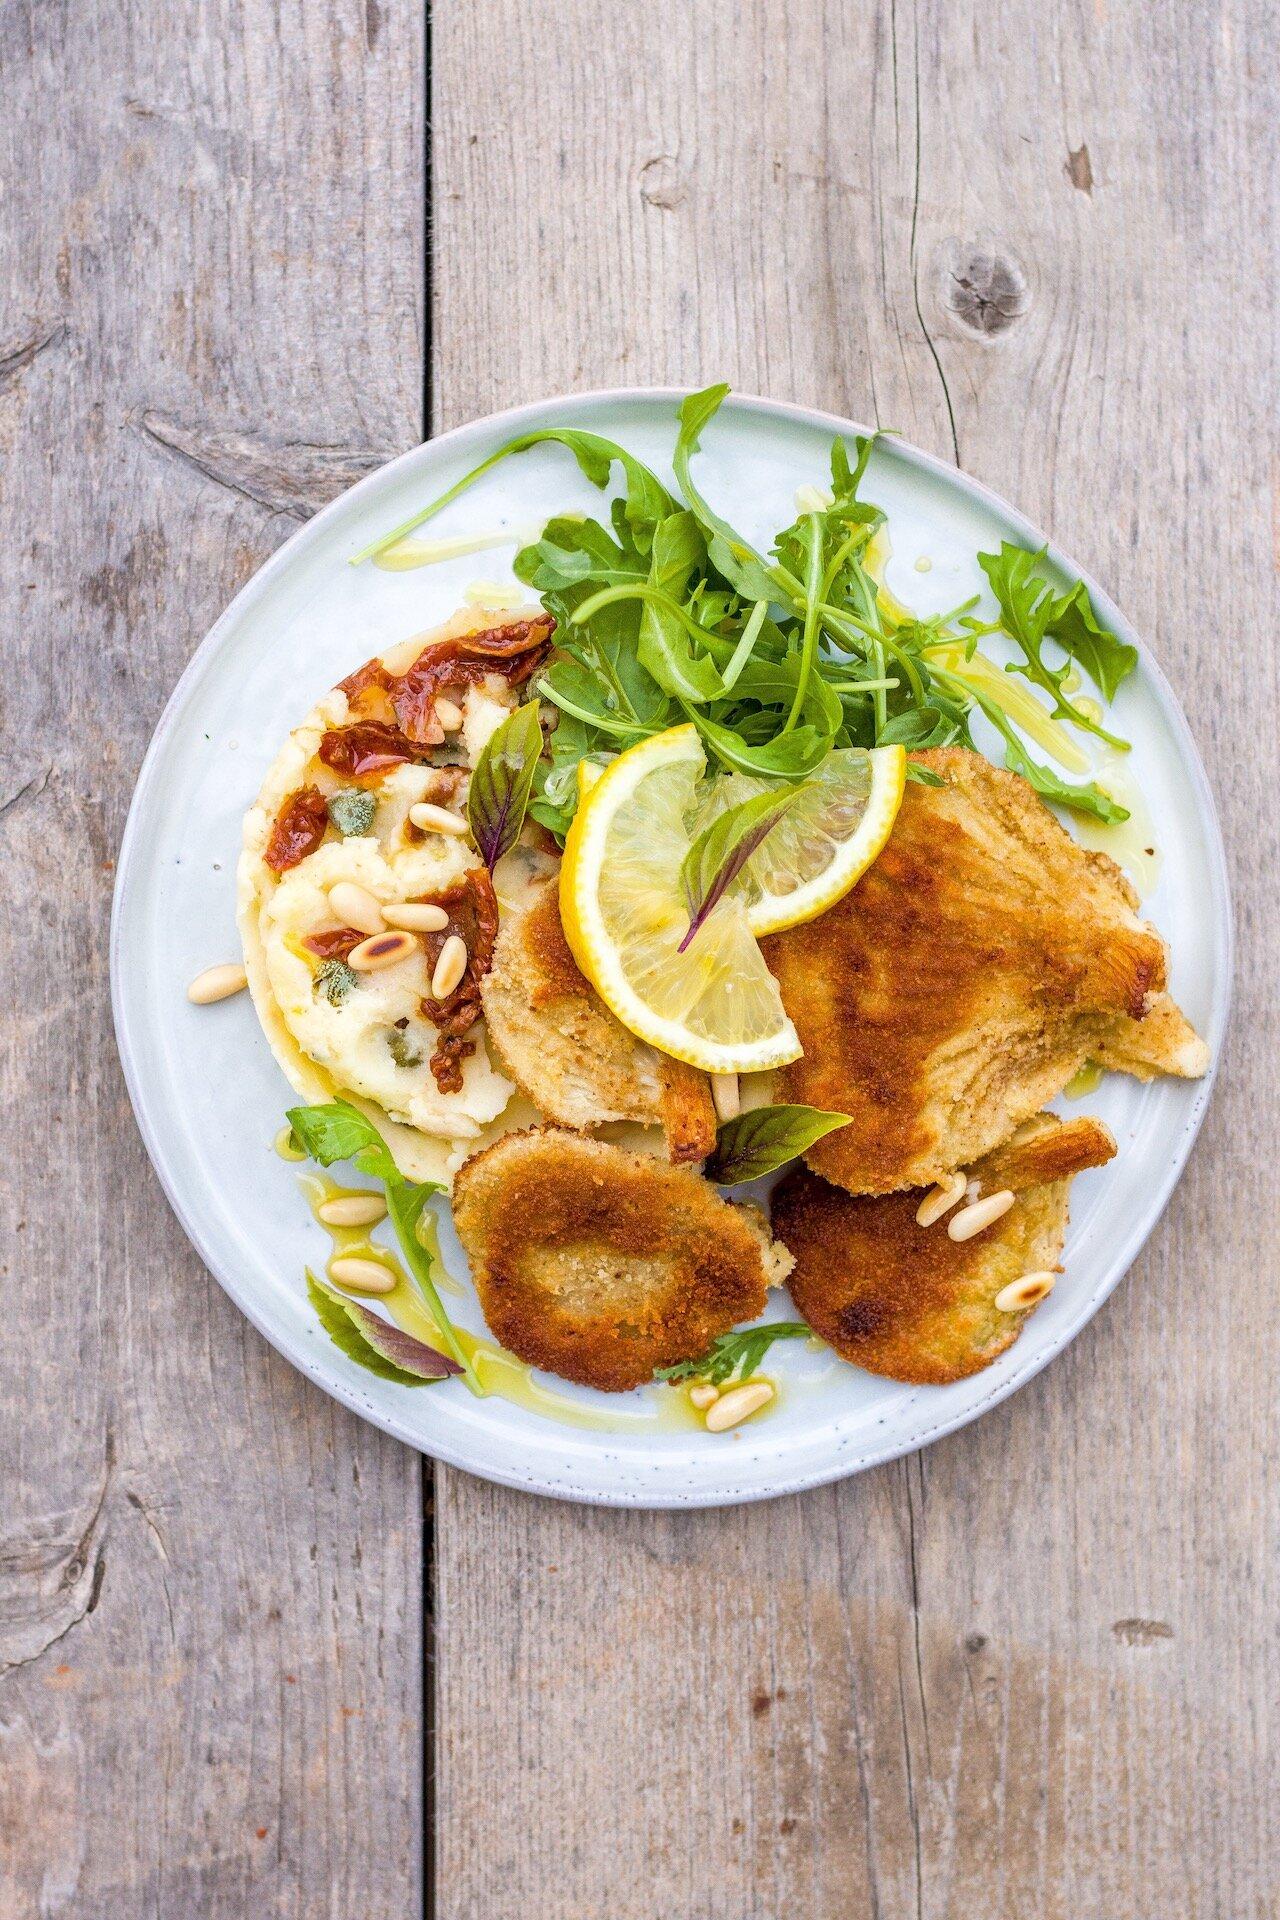 Austernpilzschnitzel mit mediterranem Kartoffelstampf - das perfekte, vegetarische Comfort Food #vegetarisch #vegan #pilze #lecker